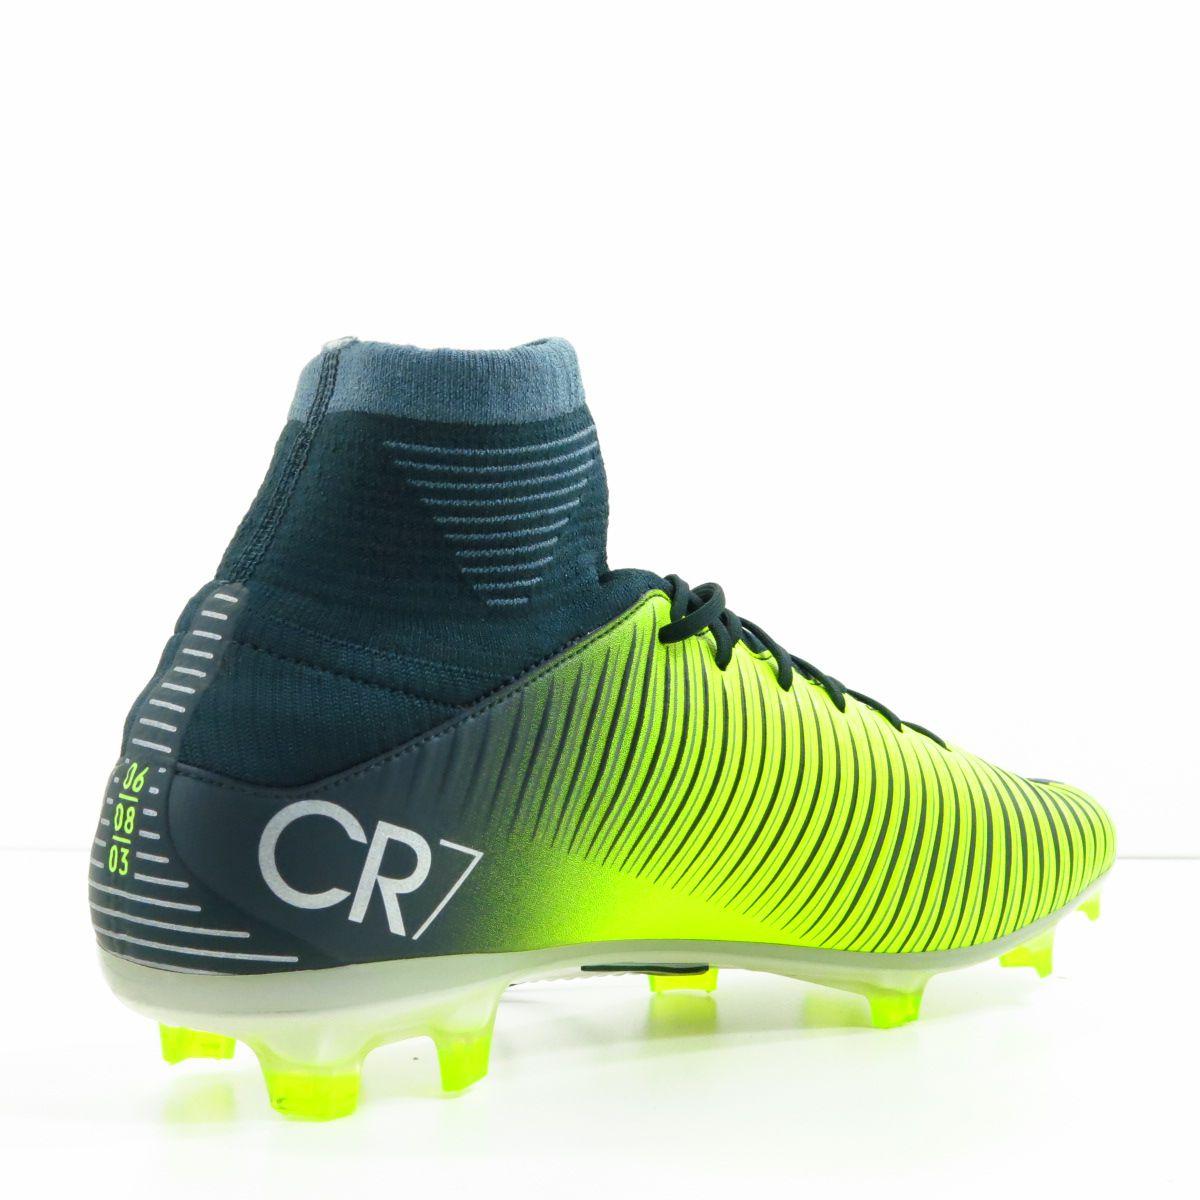 Chuteira Nike Mercurial Veloce CR7 FG Pro